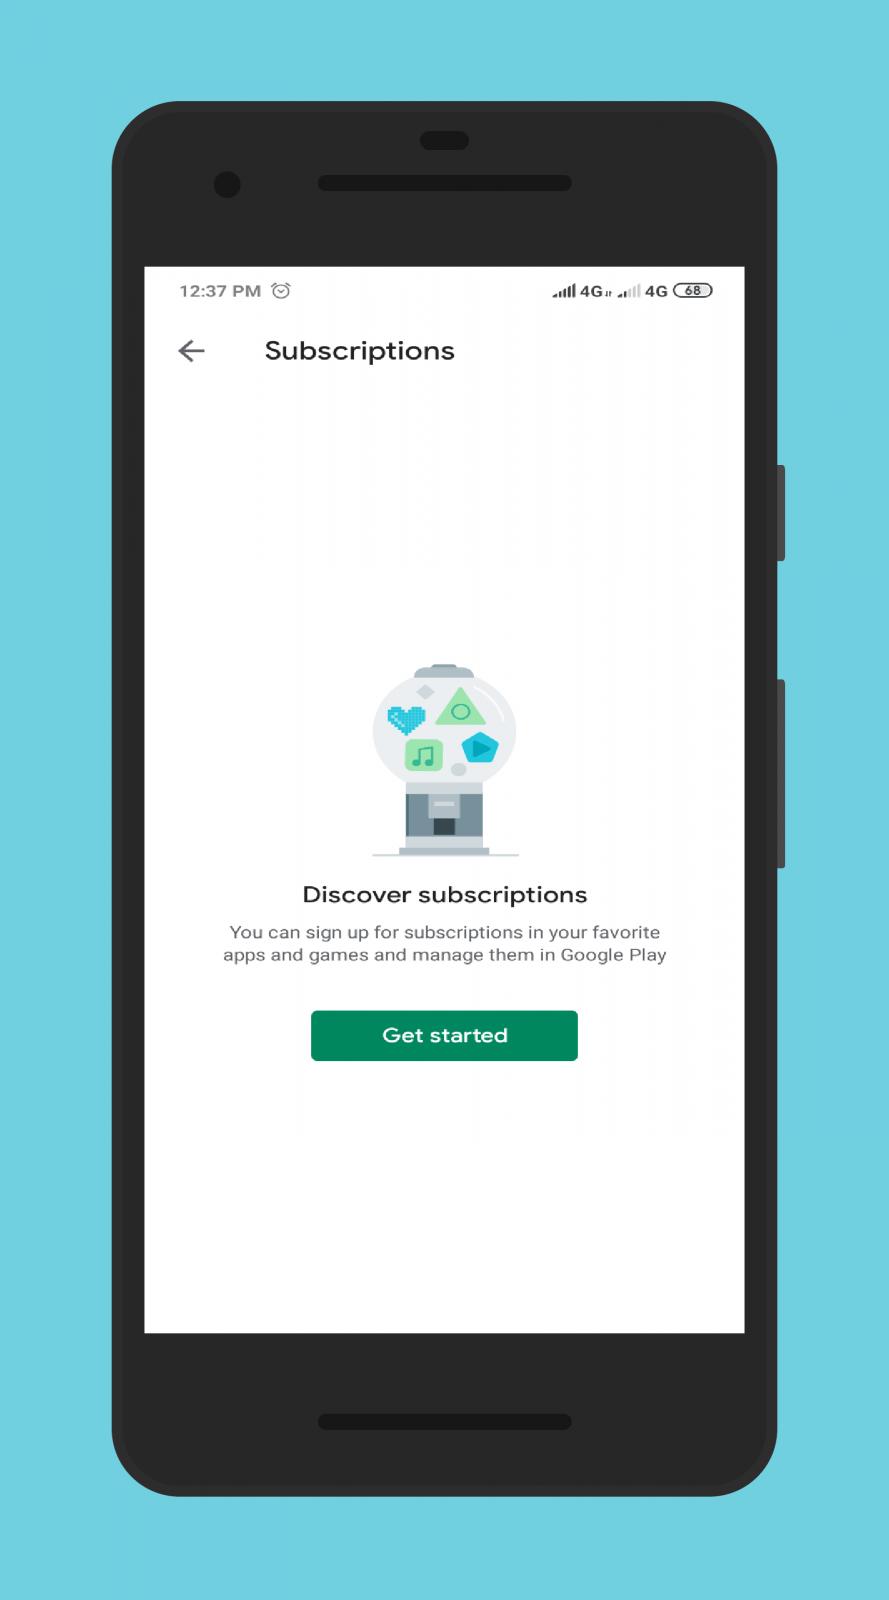 تحميل Play store – بلاي ستور [2021] للأندرويد